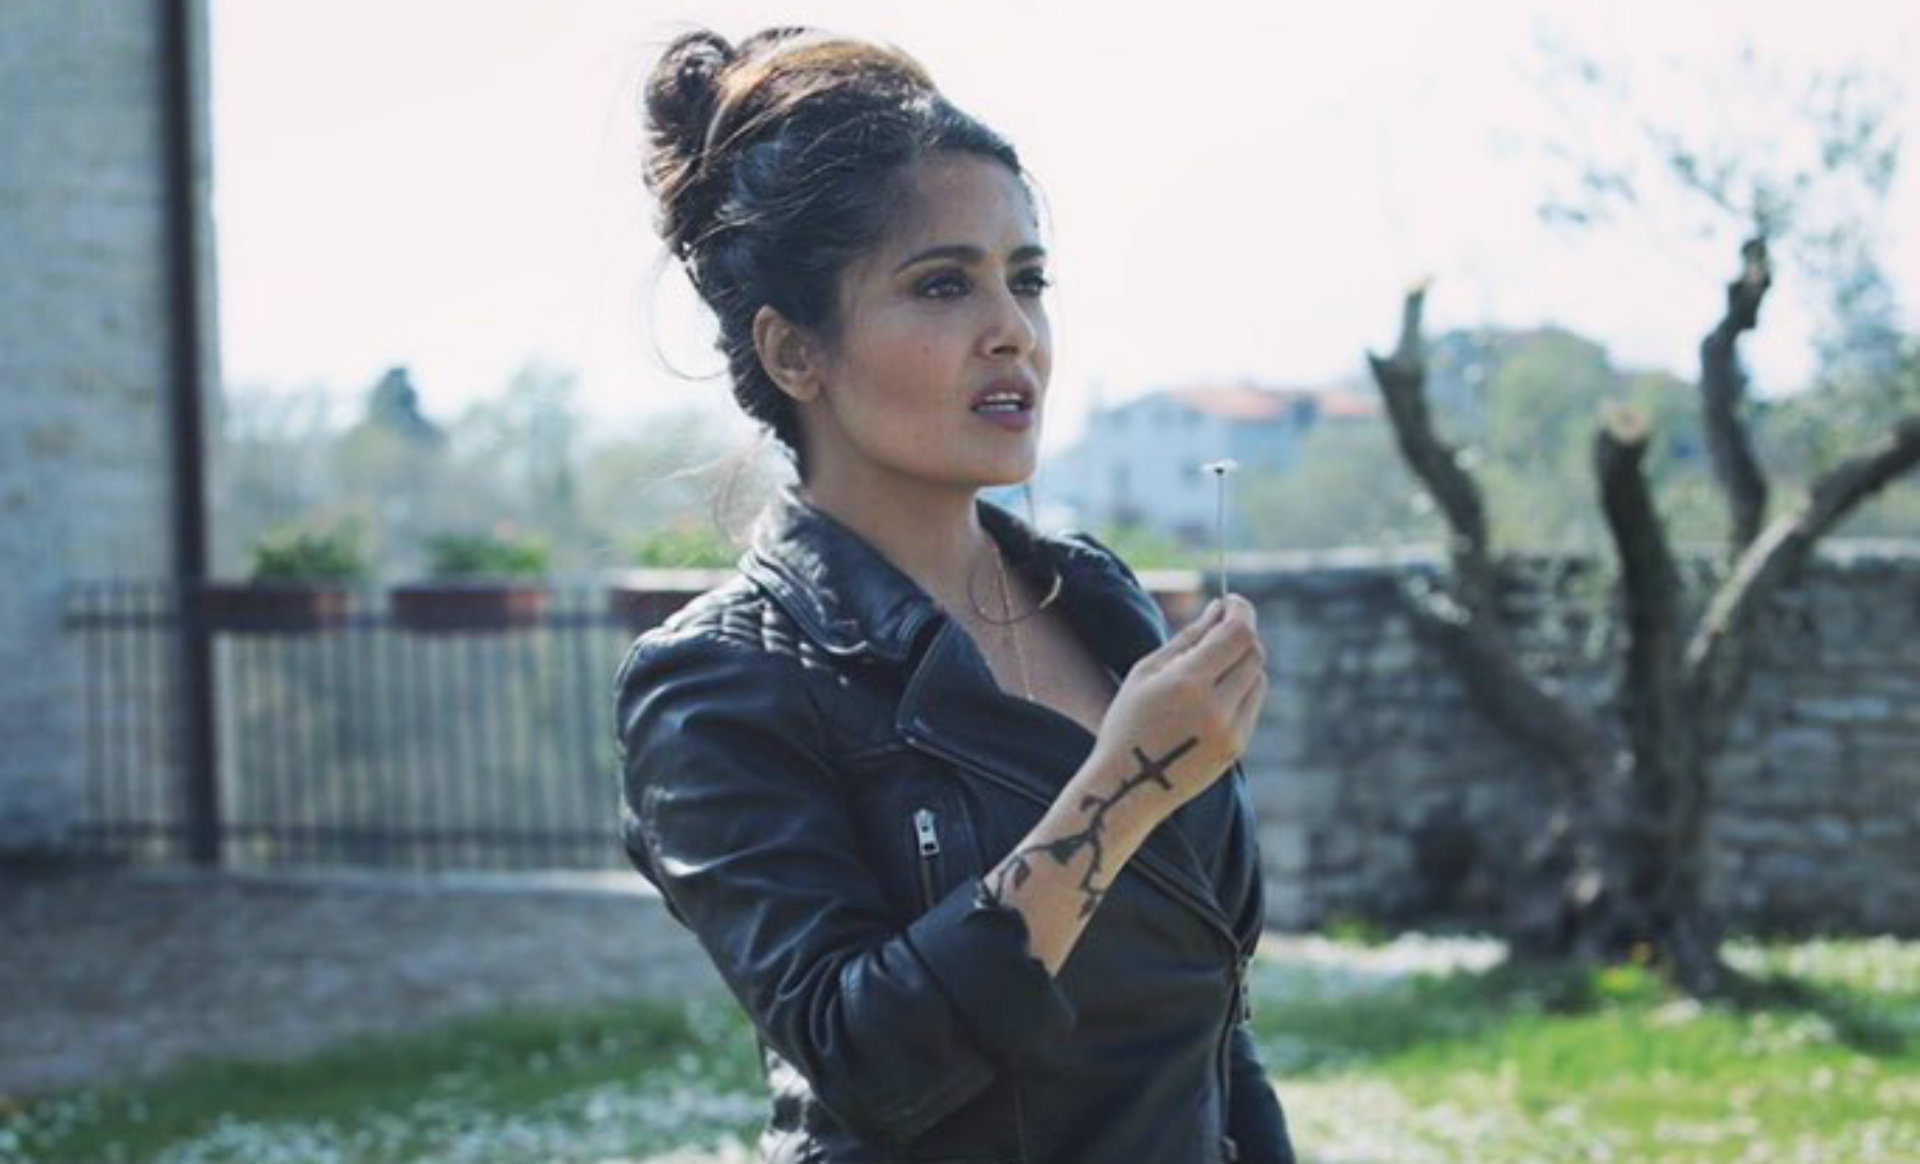 Actriz Porno Tatuaje Gato Estrellas Espalda el tatuaje íntimo de salma hayek: la estrella mexicana